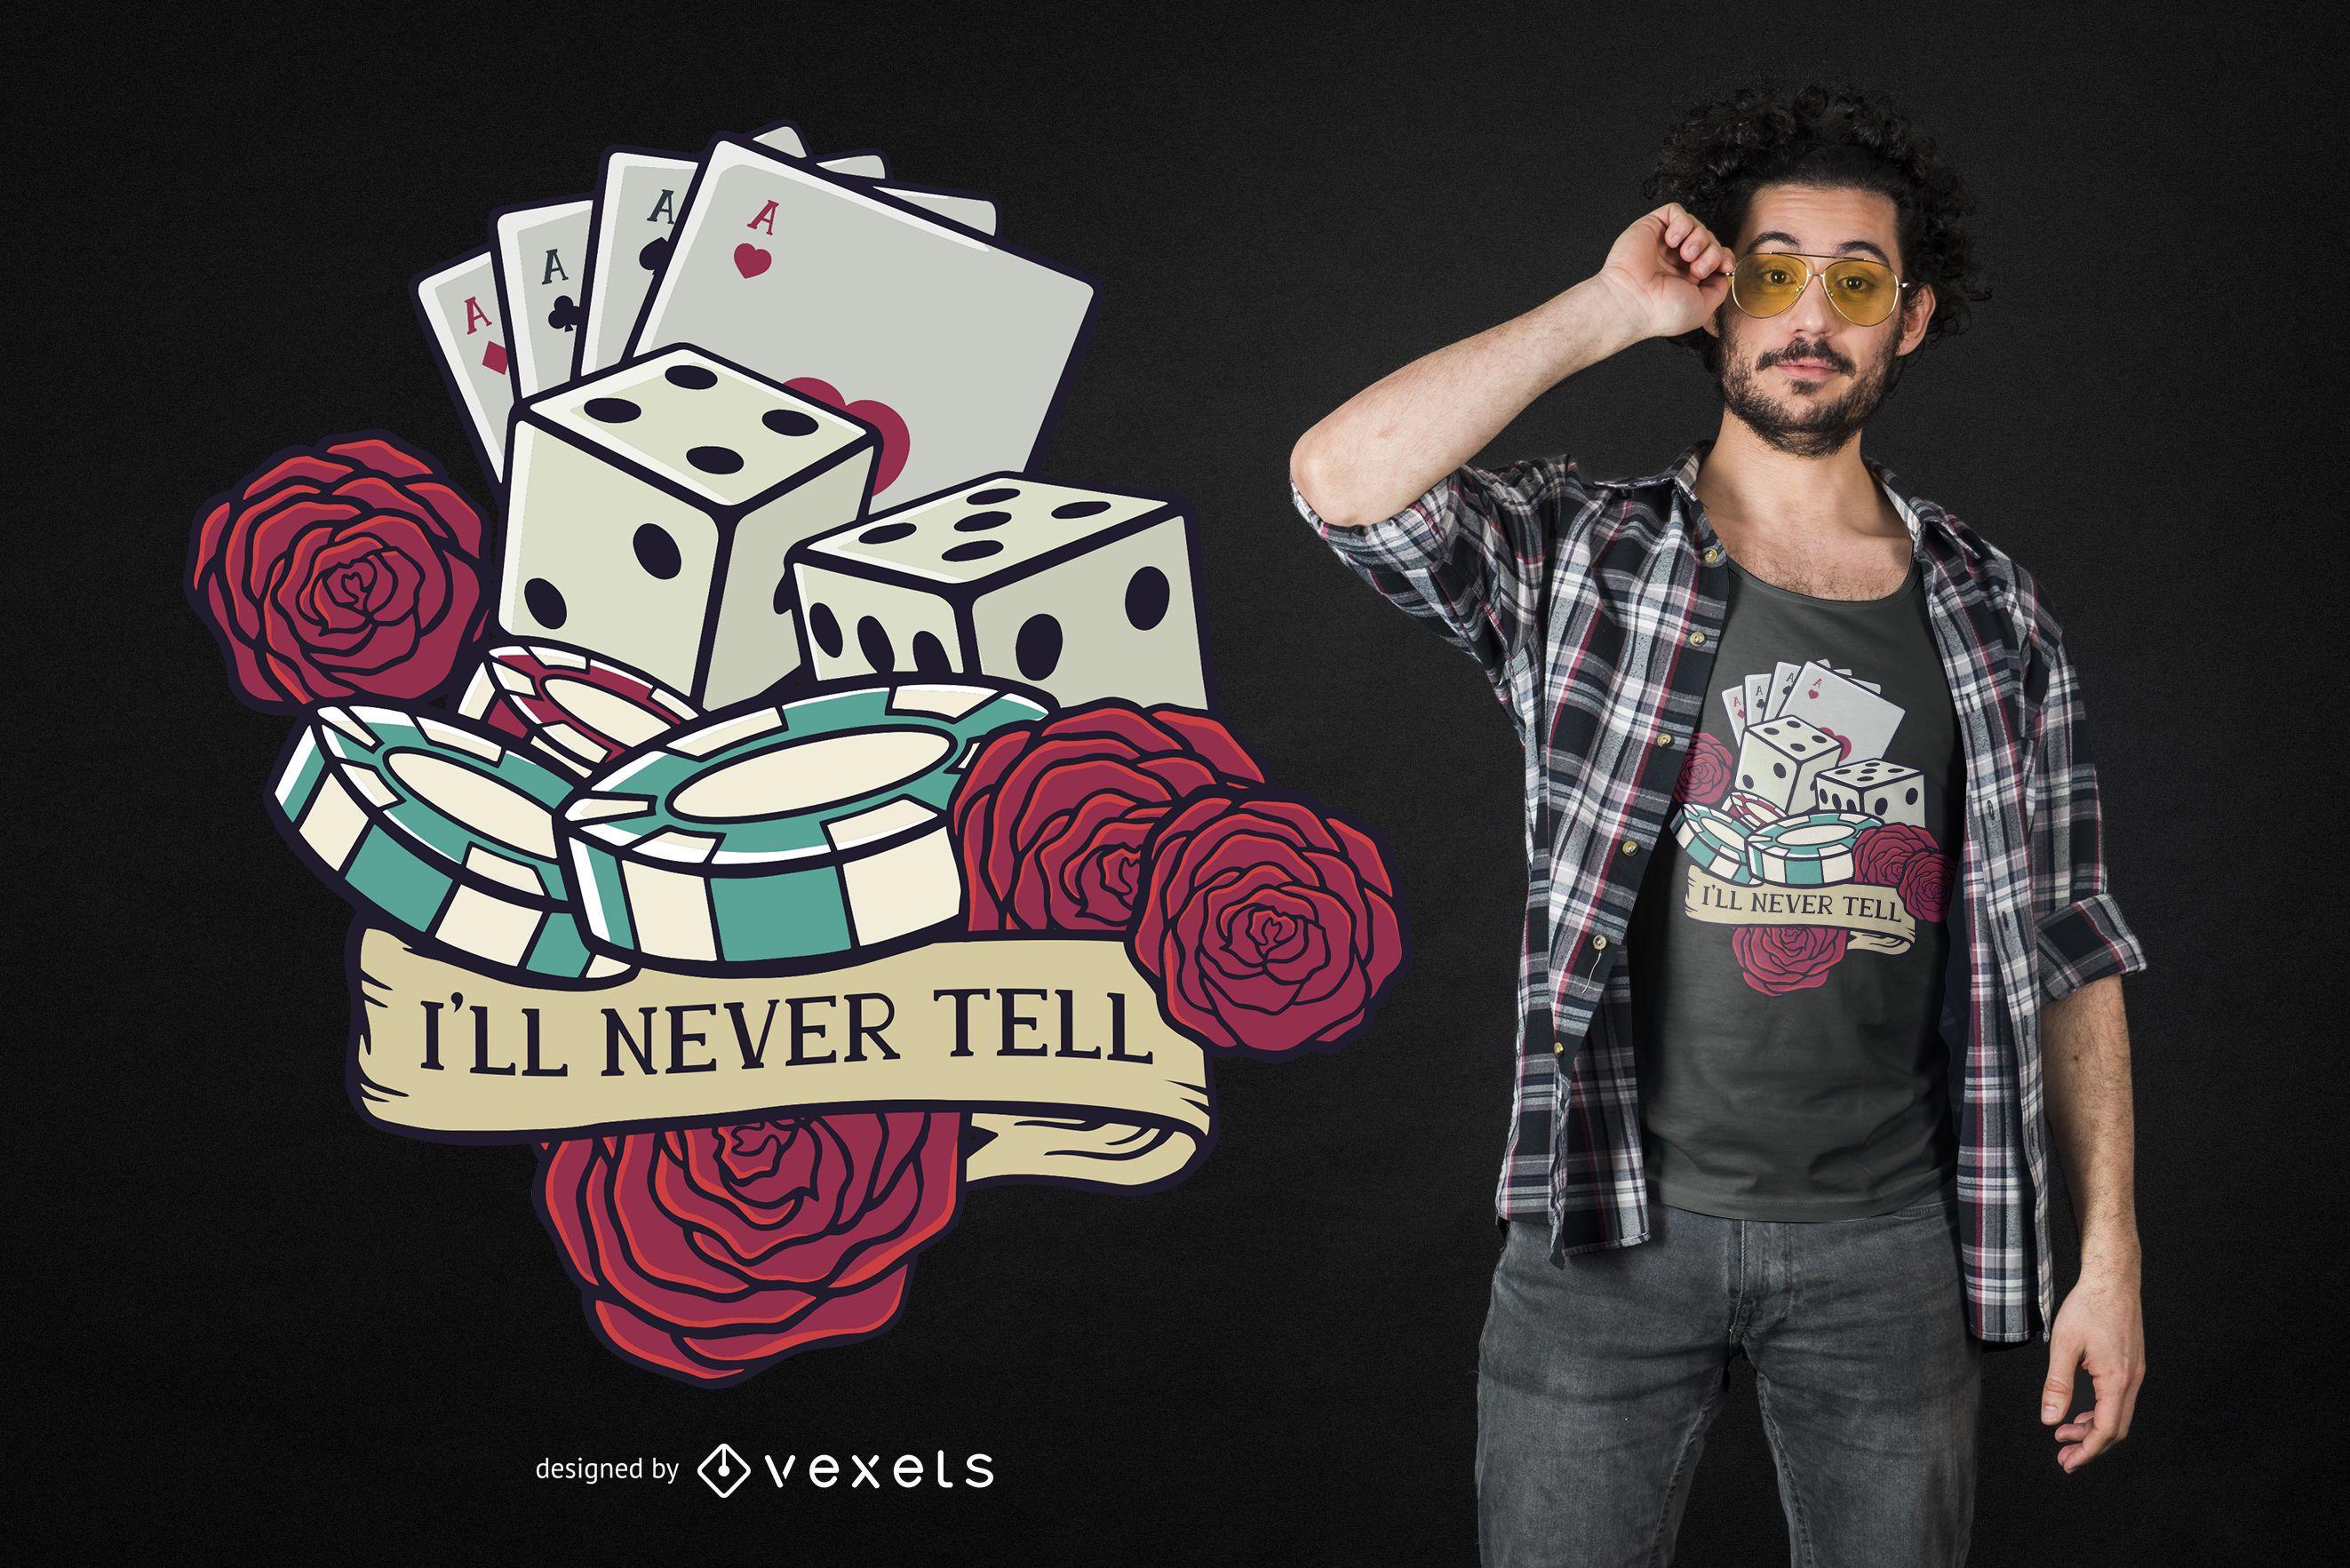 Lustiges Kasino-Zitat-T-Shirt-Design